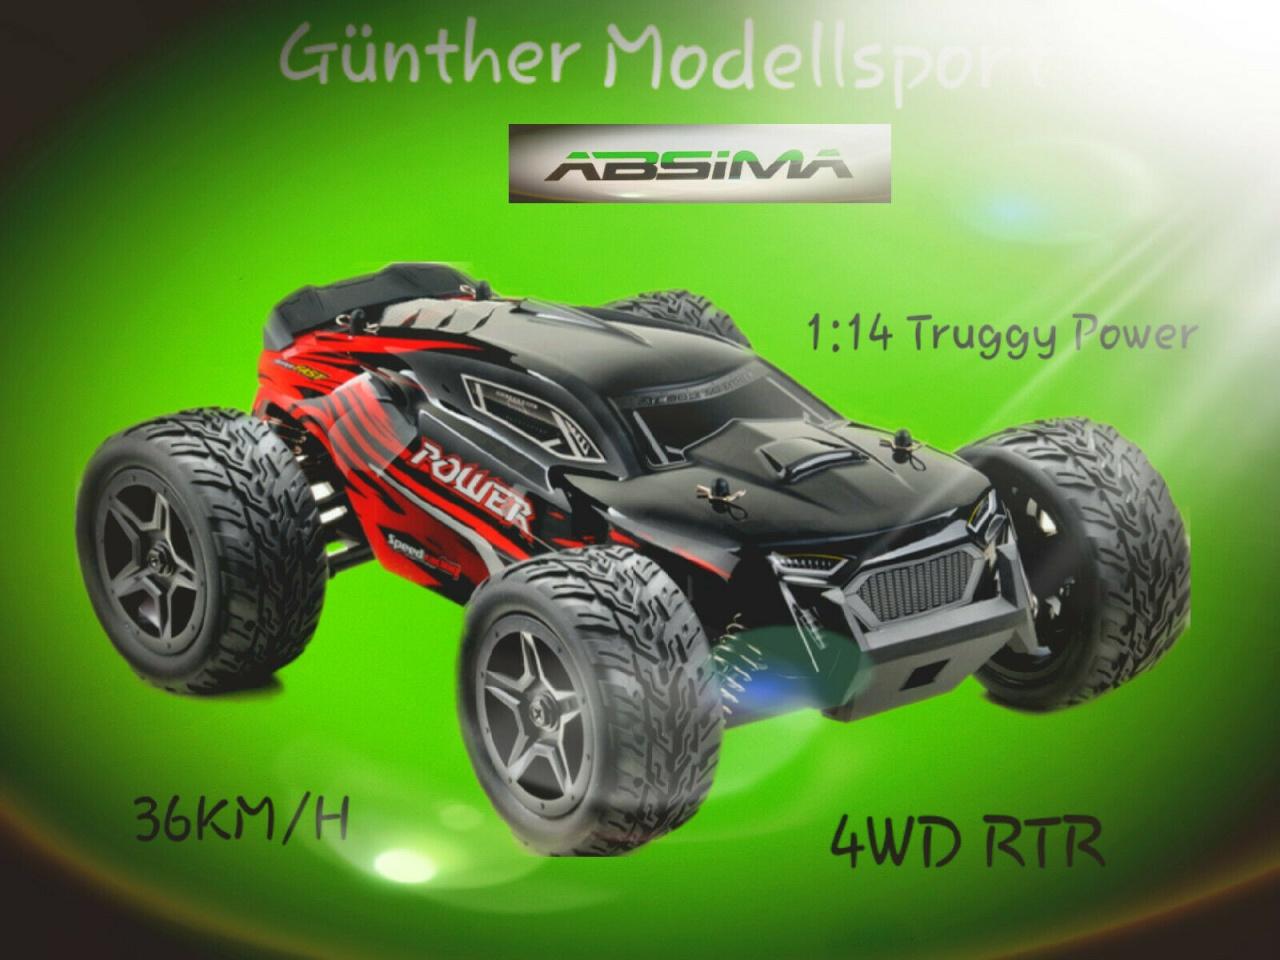 Absima 1:14 EP Truggy POWER schwarz/rot 4WD RTR, 14001